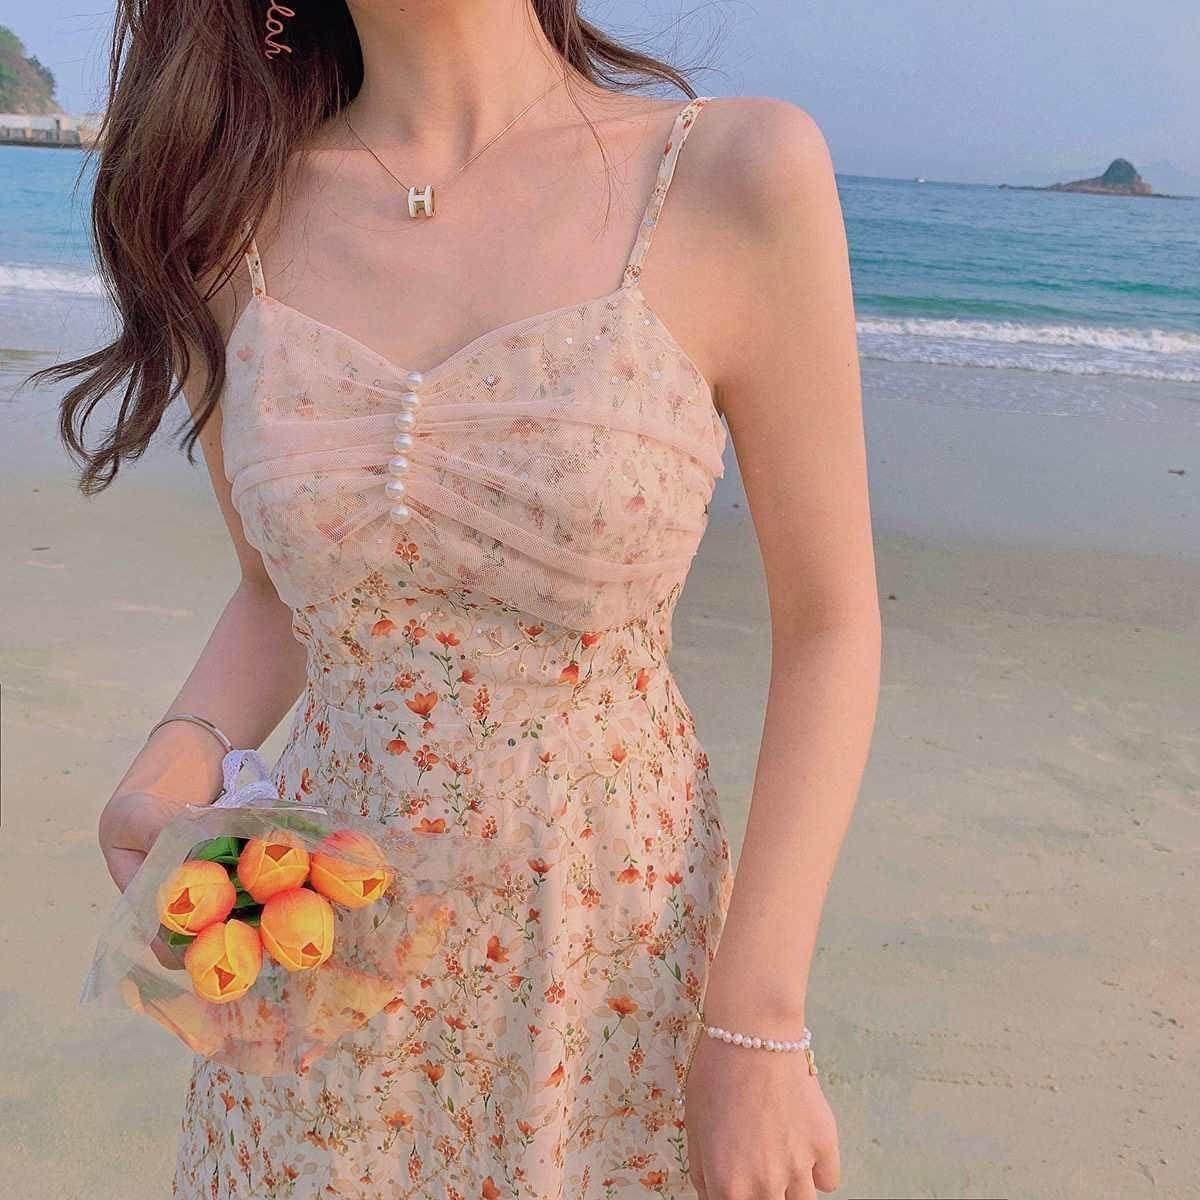 Uongfi Wedding Dresses for Bride Elegant Strǎp Dress Women Ko